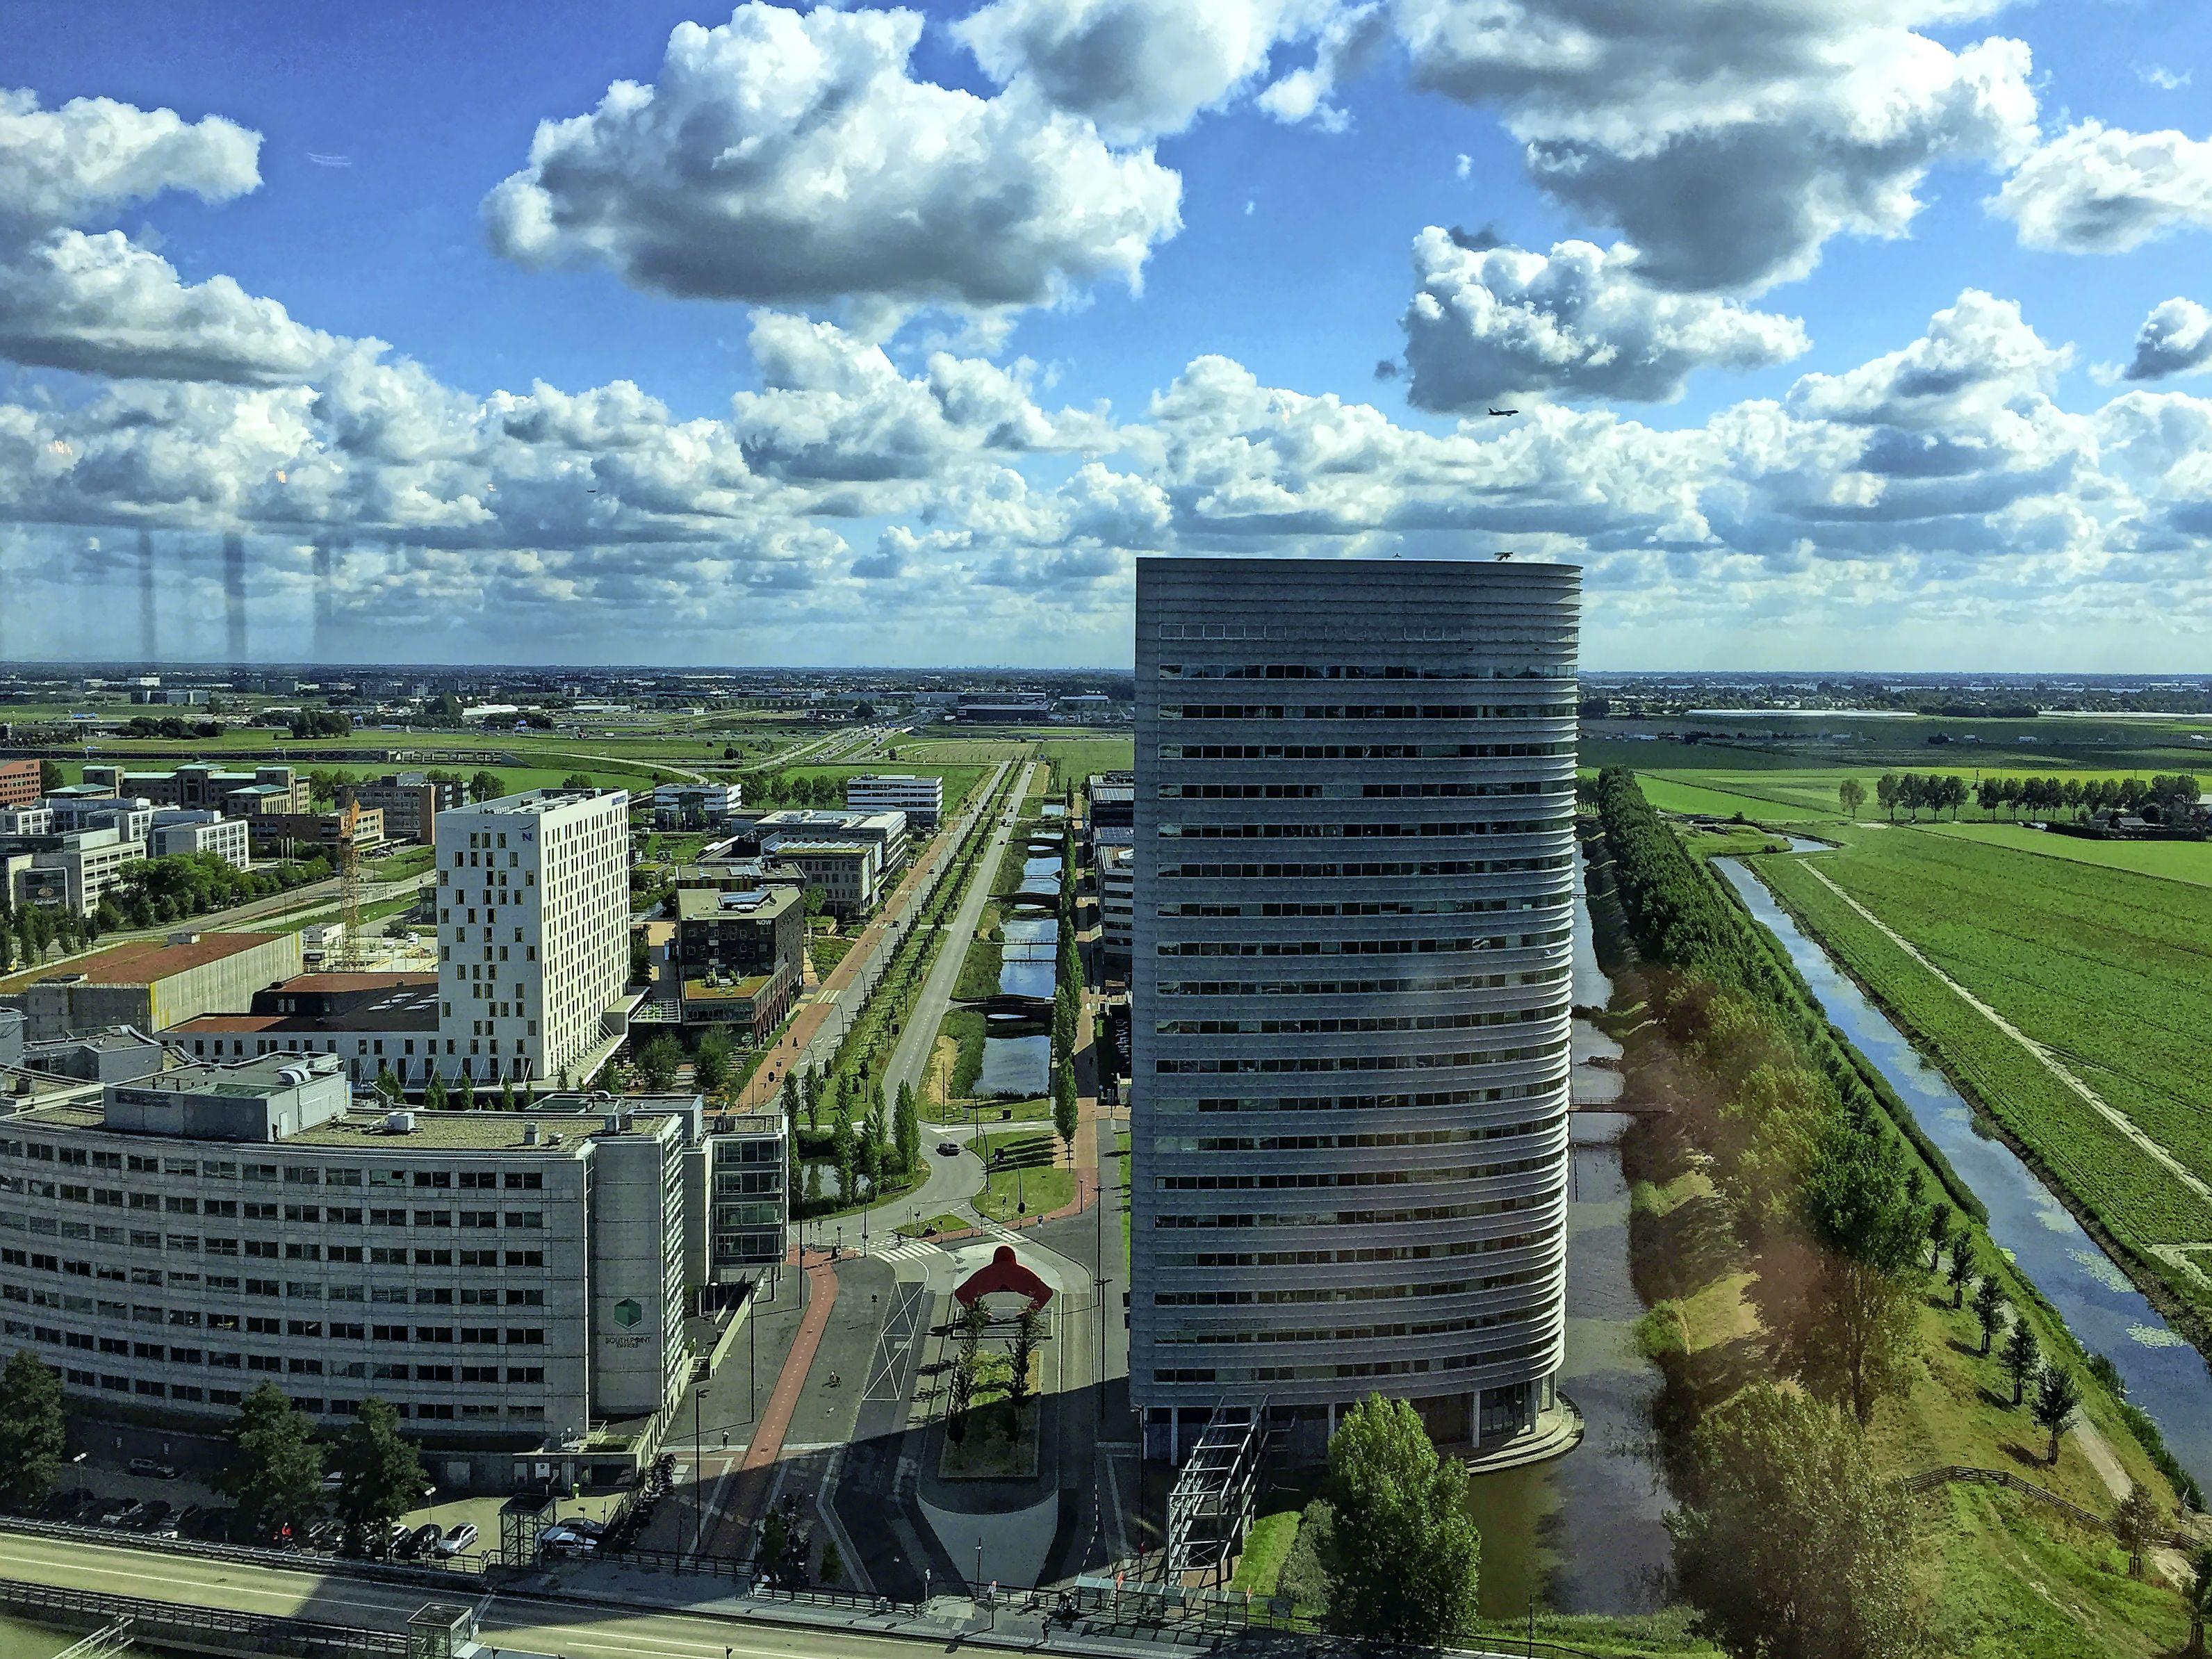 Coronacrisis? Haarlemmermeer verkoopt in 2020 veel meer grond dan verwacht